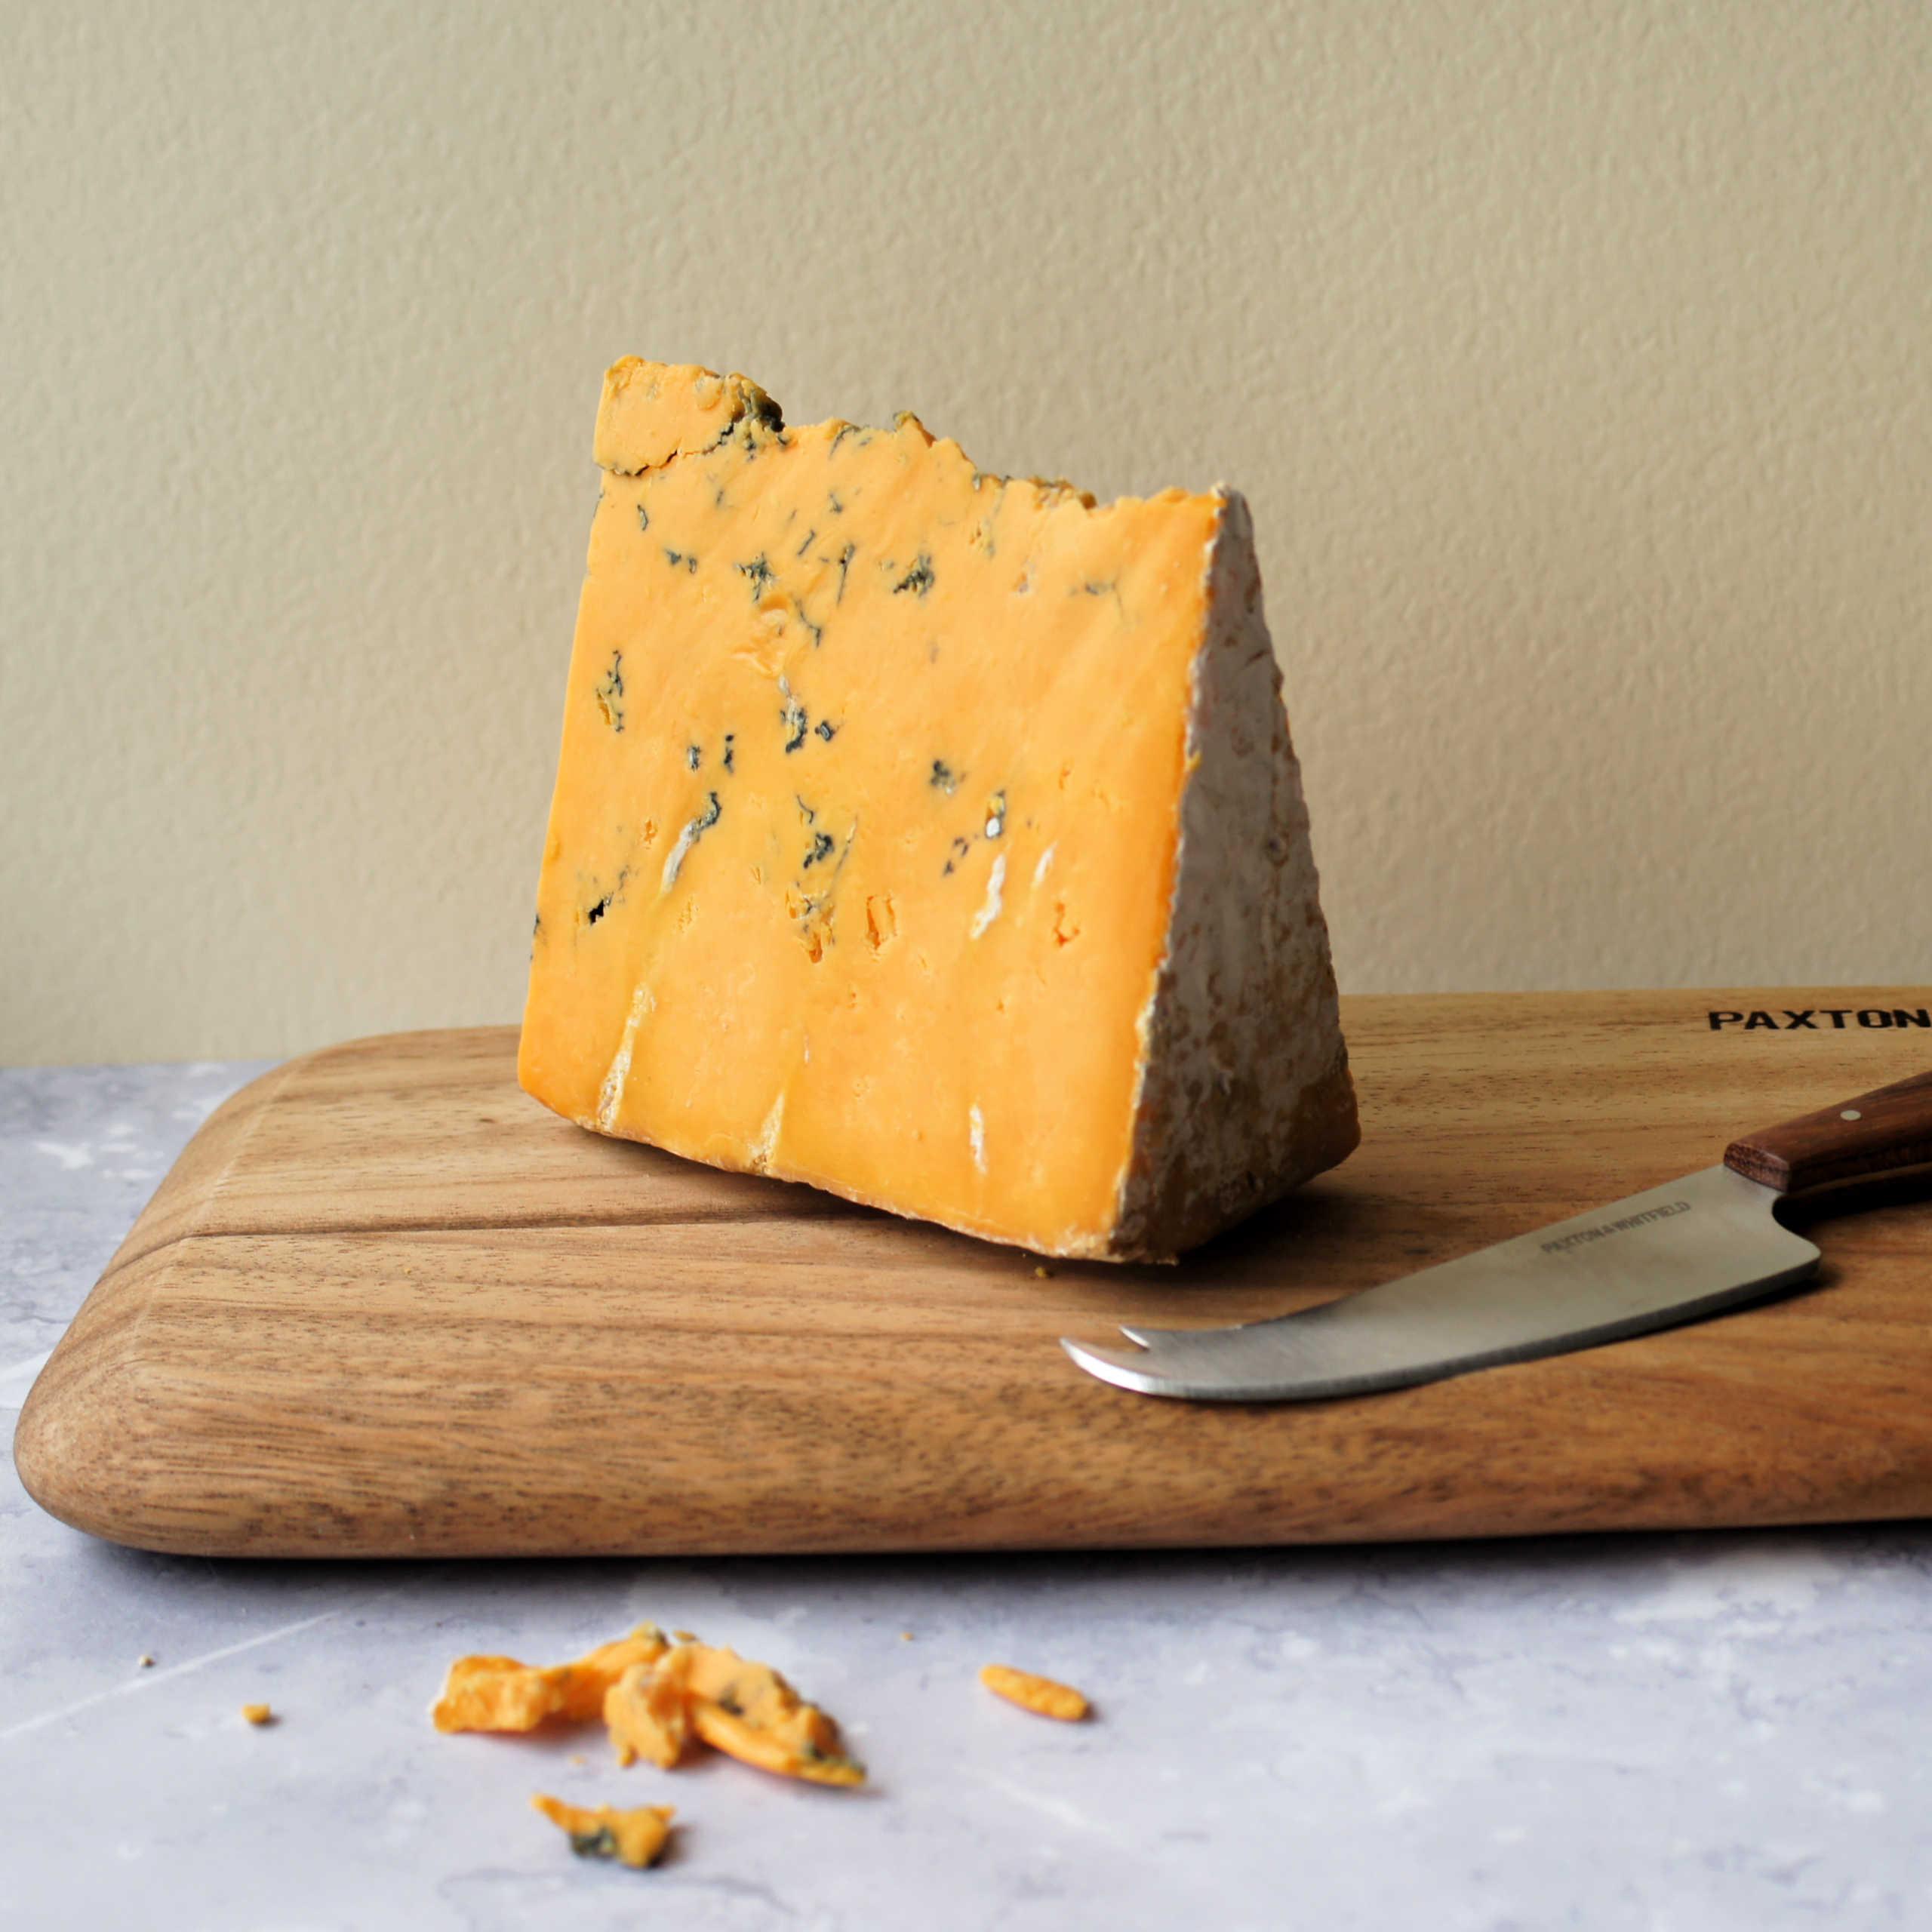 Shropshire-Blue-Cheese-Low-ResnaHt1k4AHZ5iP